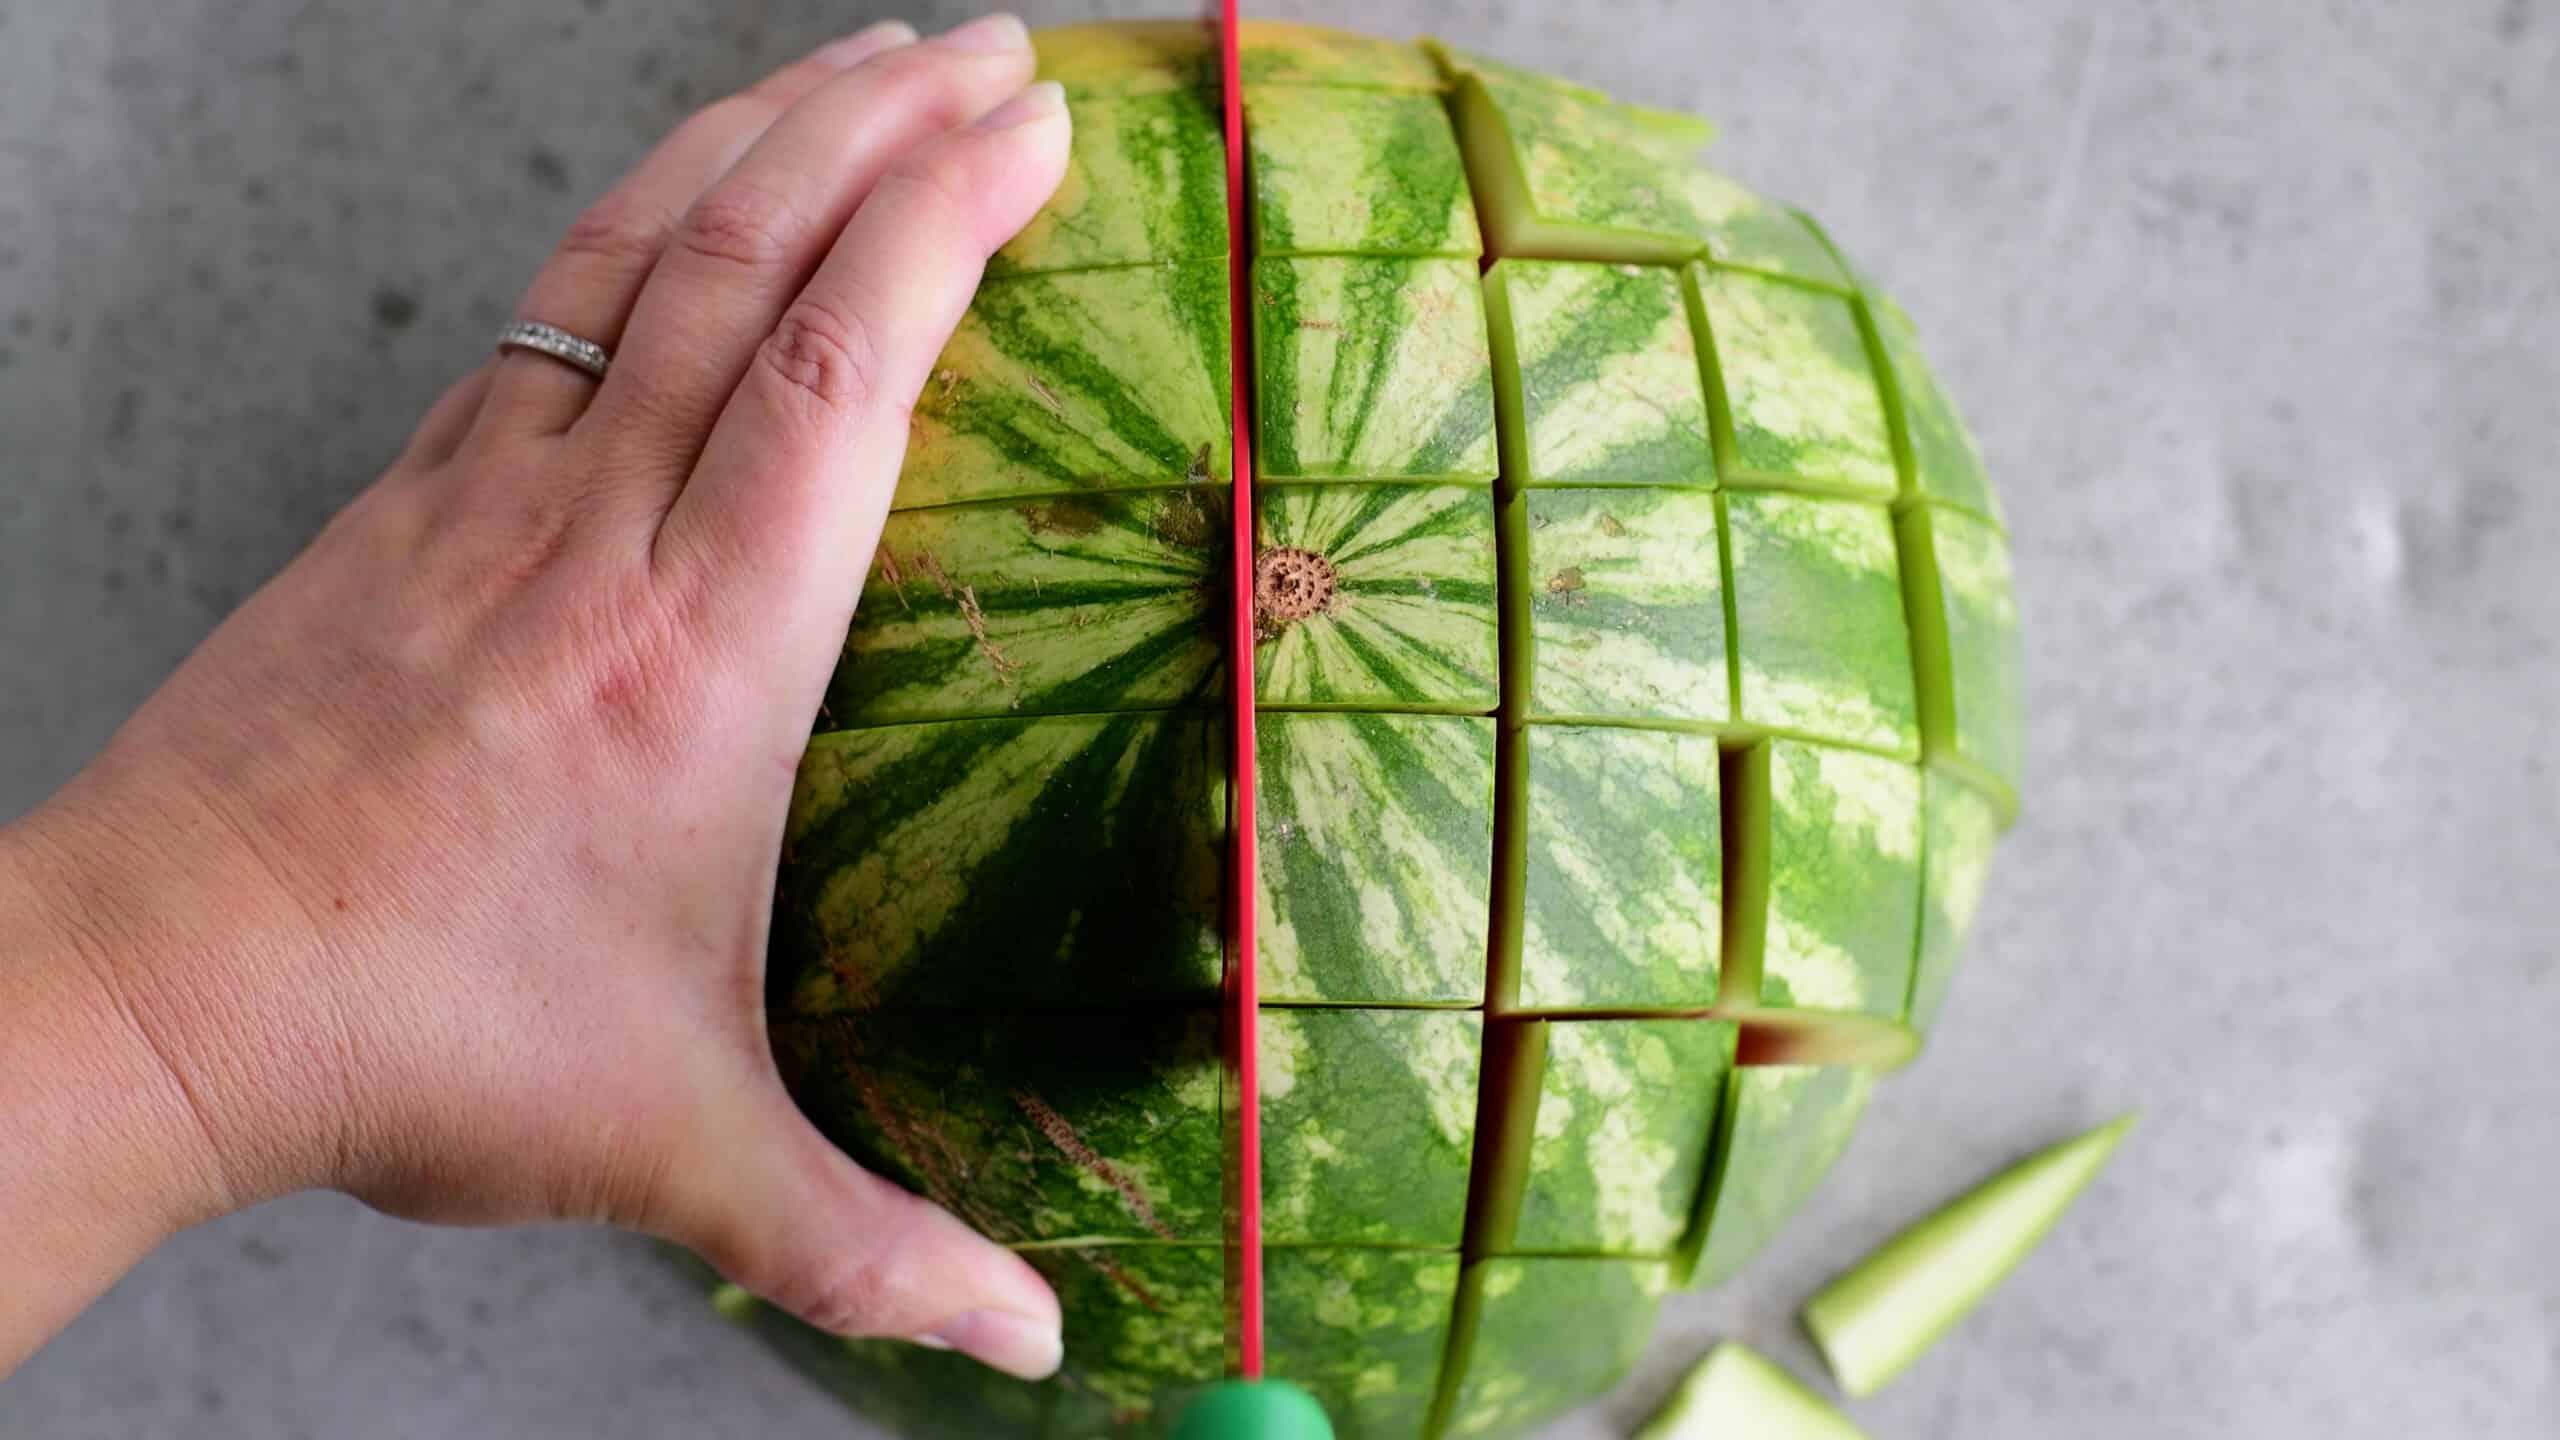 cutting a watermelon into sticks